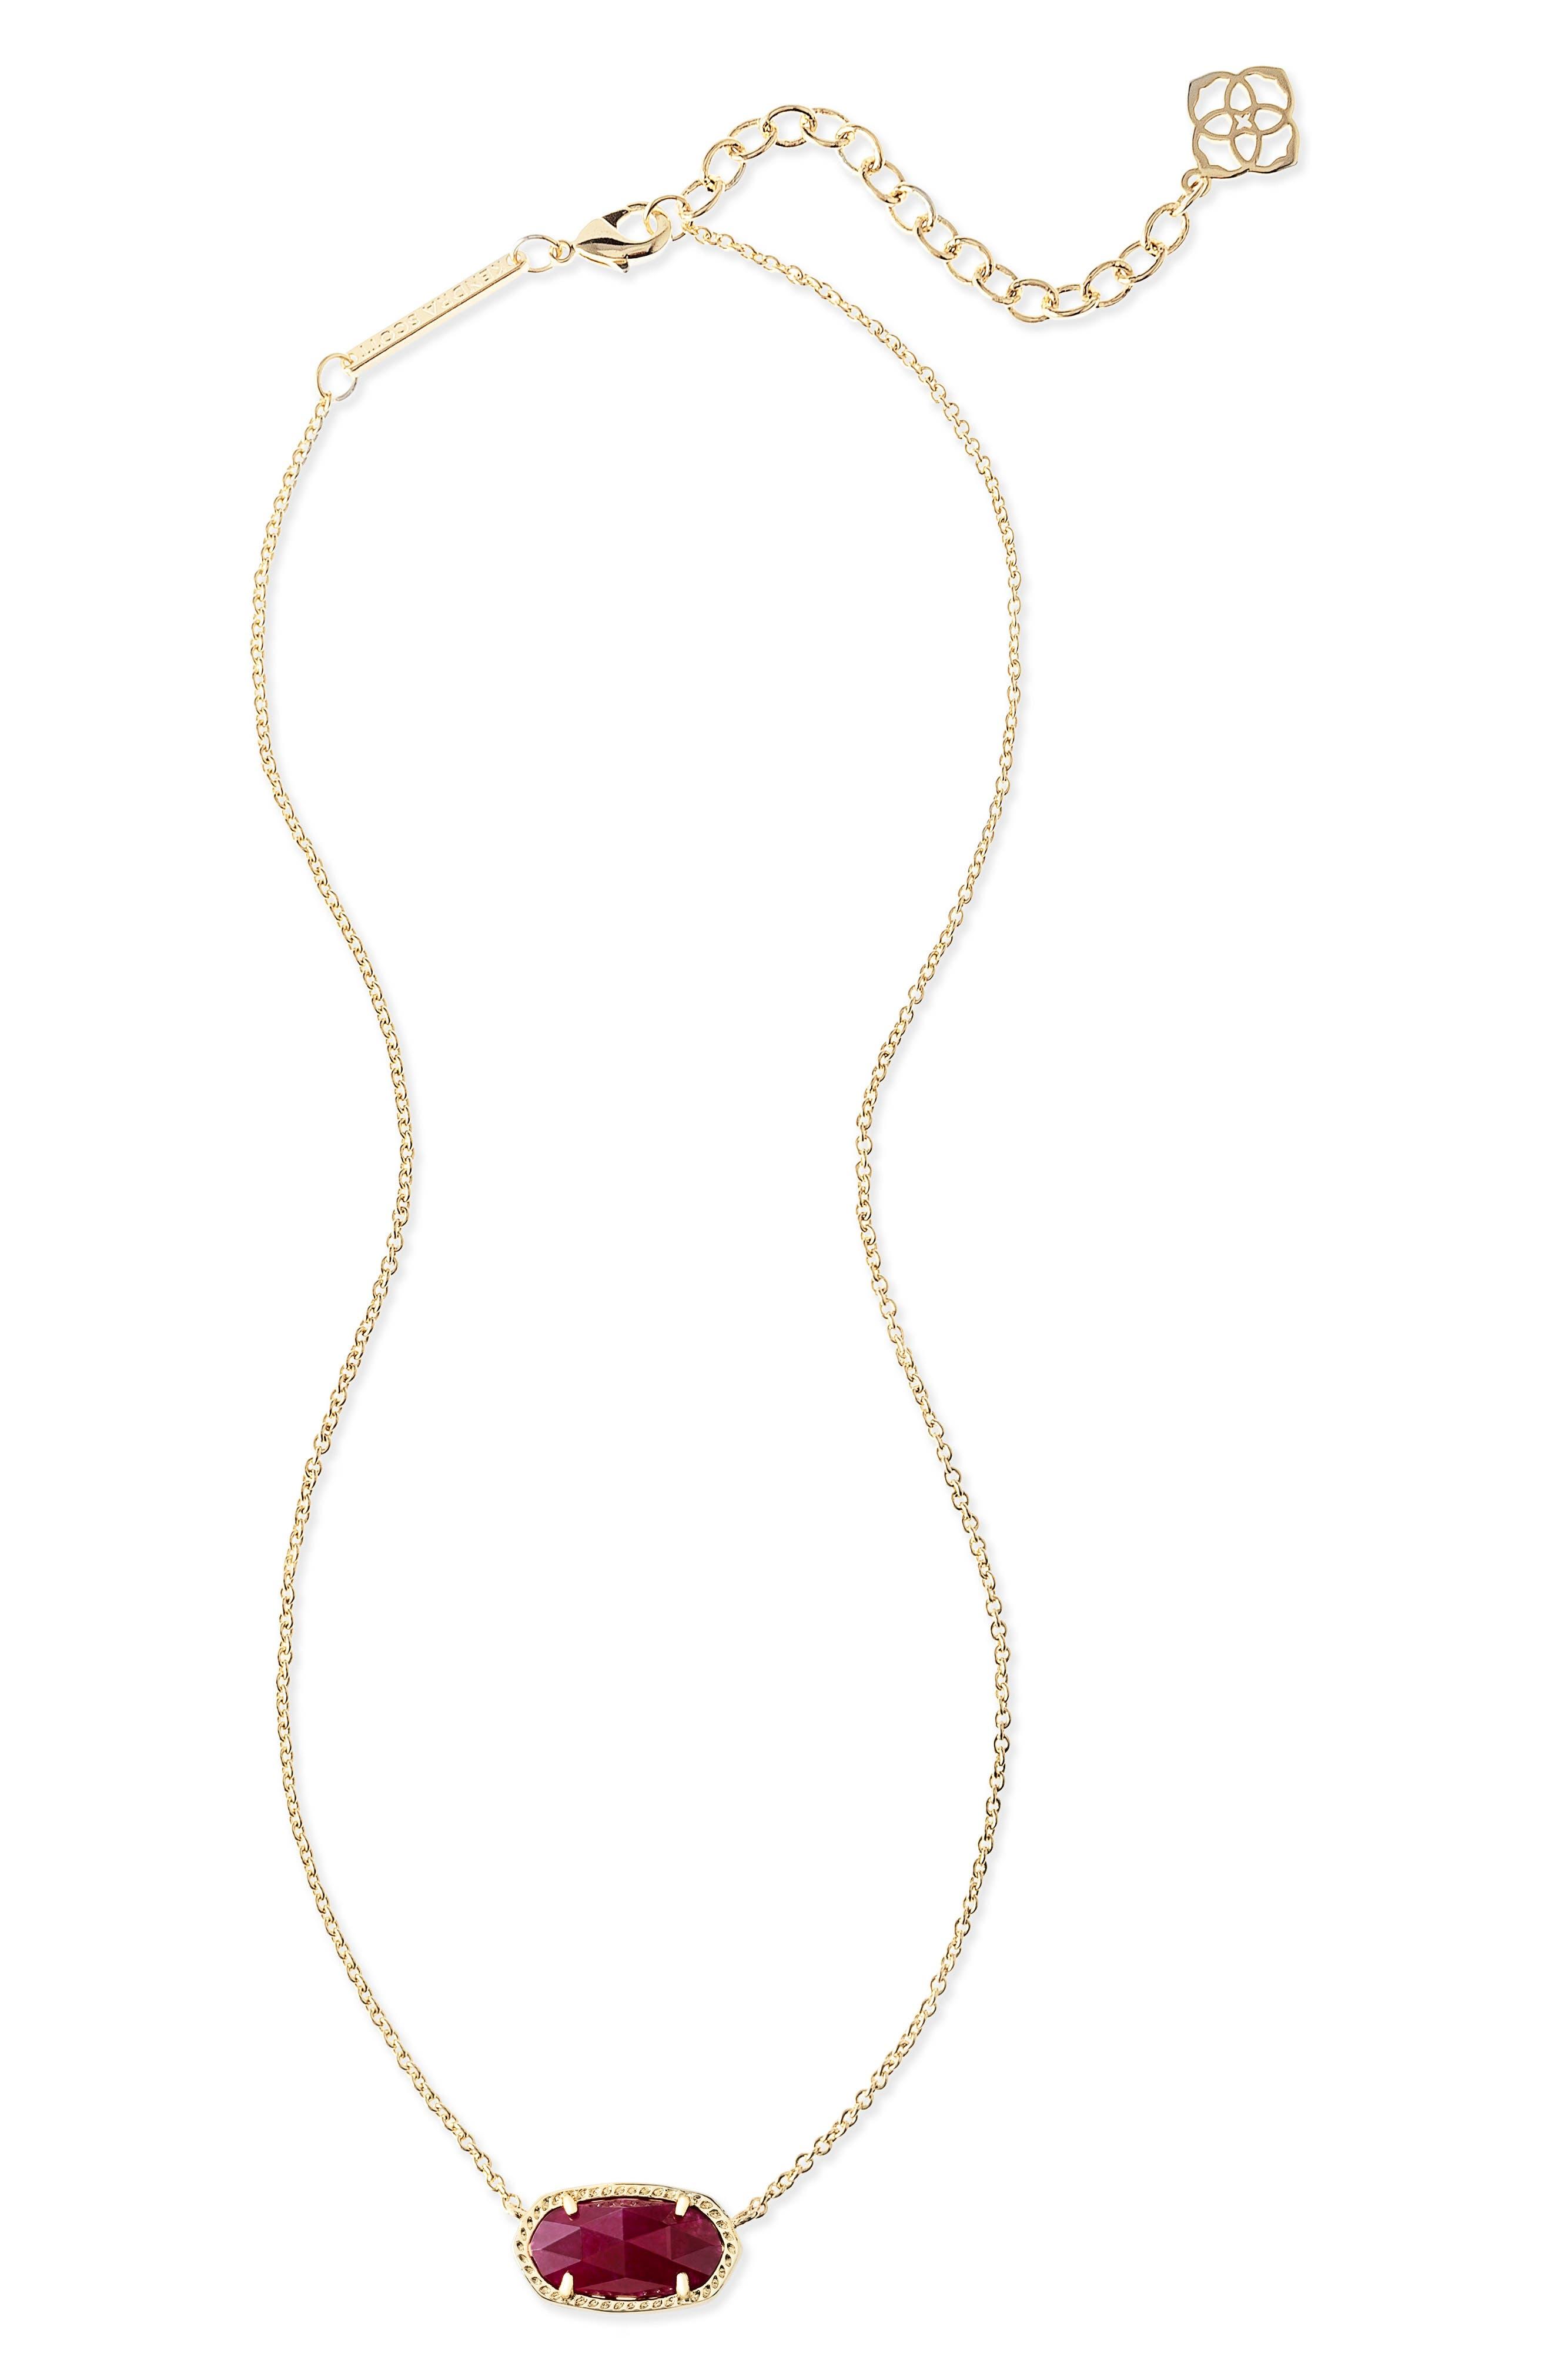 Elisa Pendant Necklace,                             Alternate thumbnail 2, color,                             Maroon Jade/ Gold